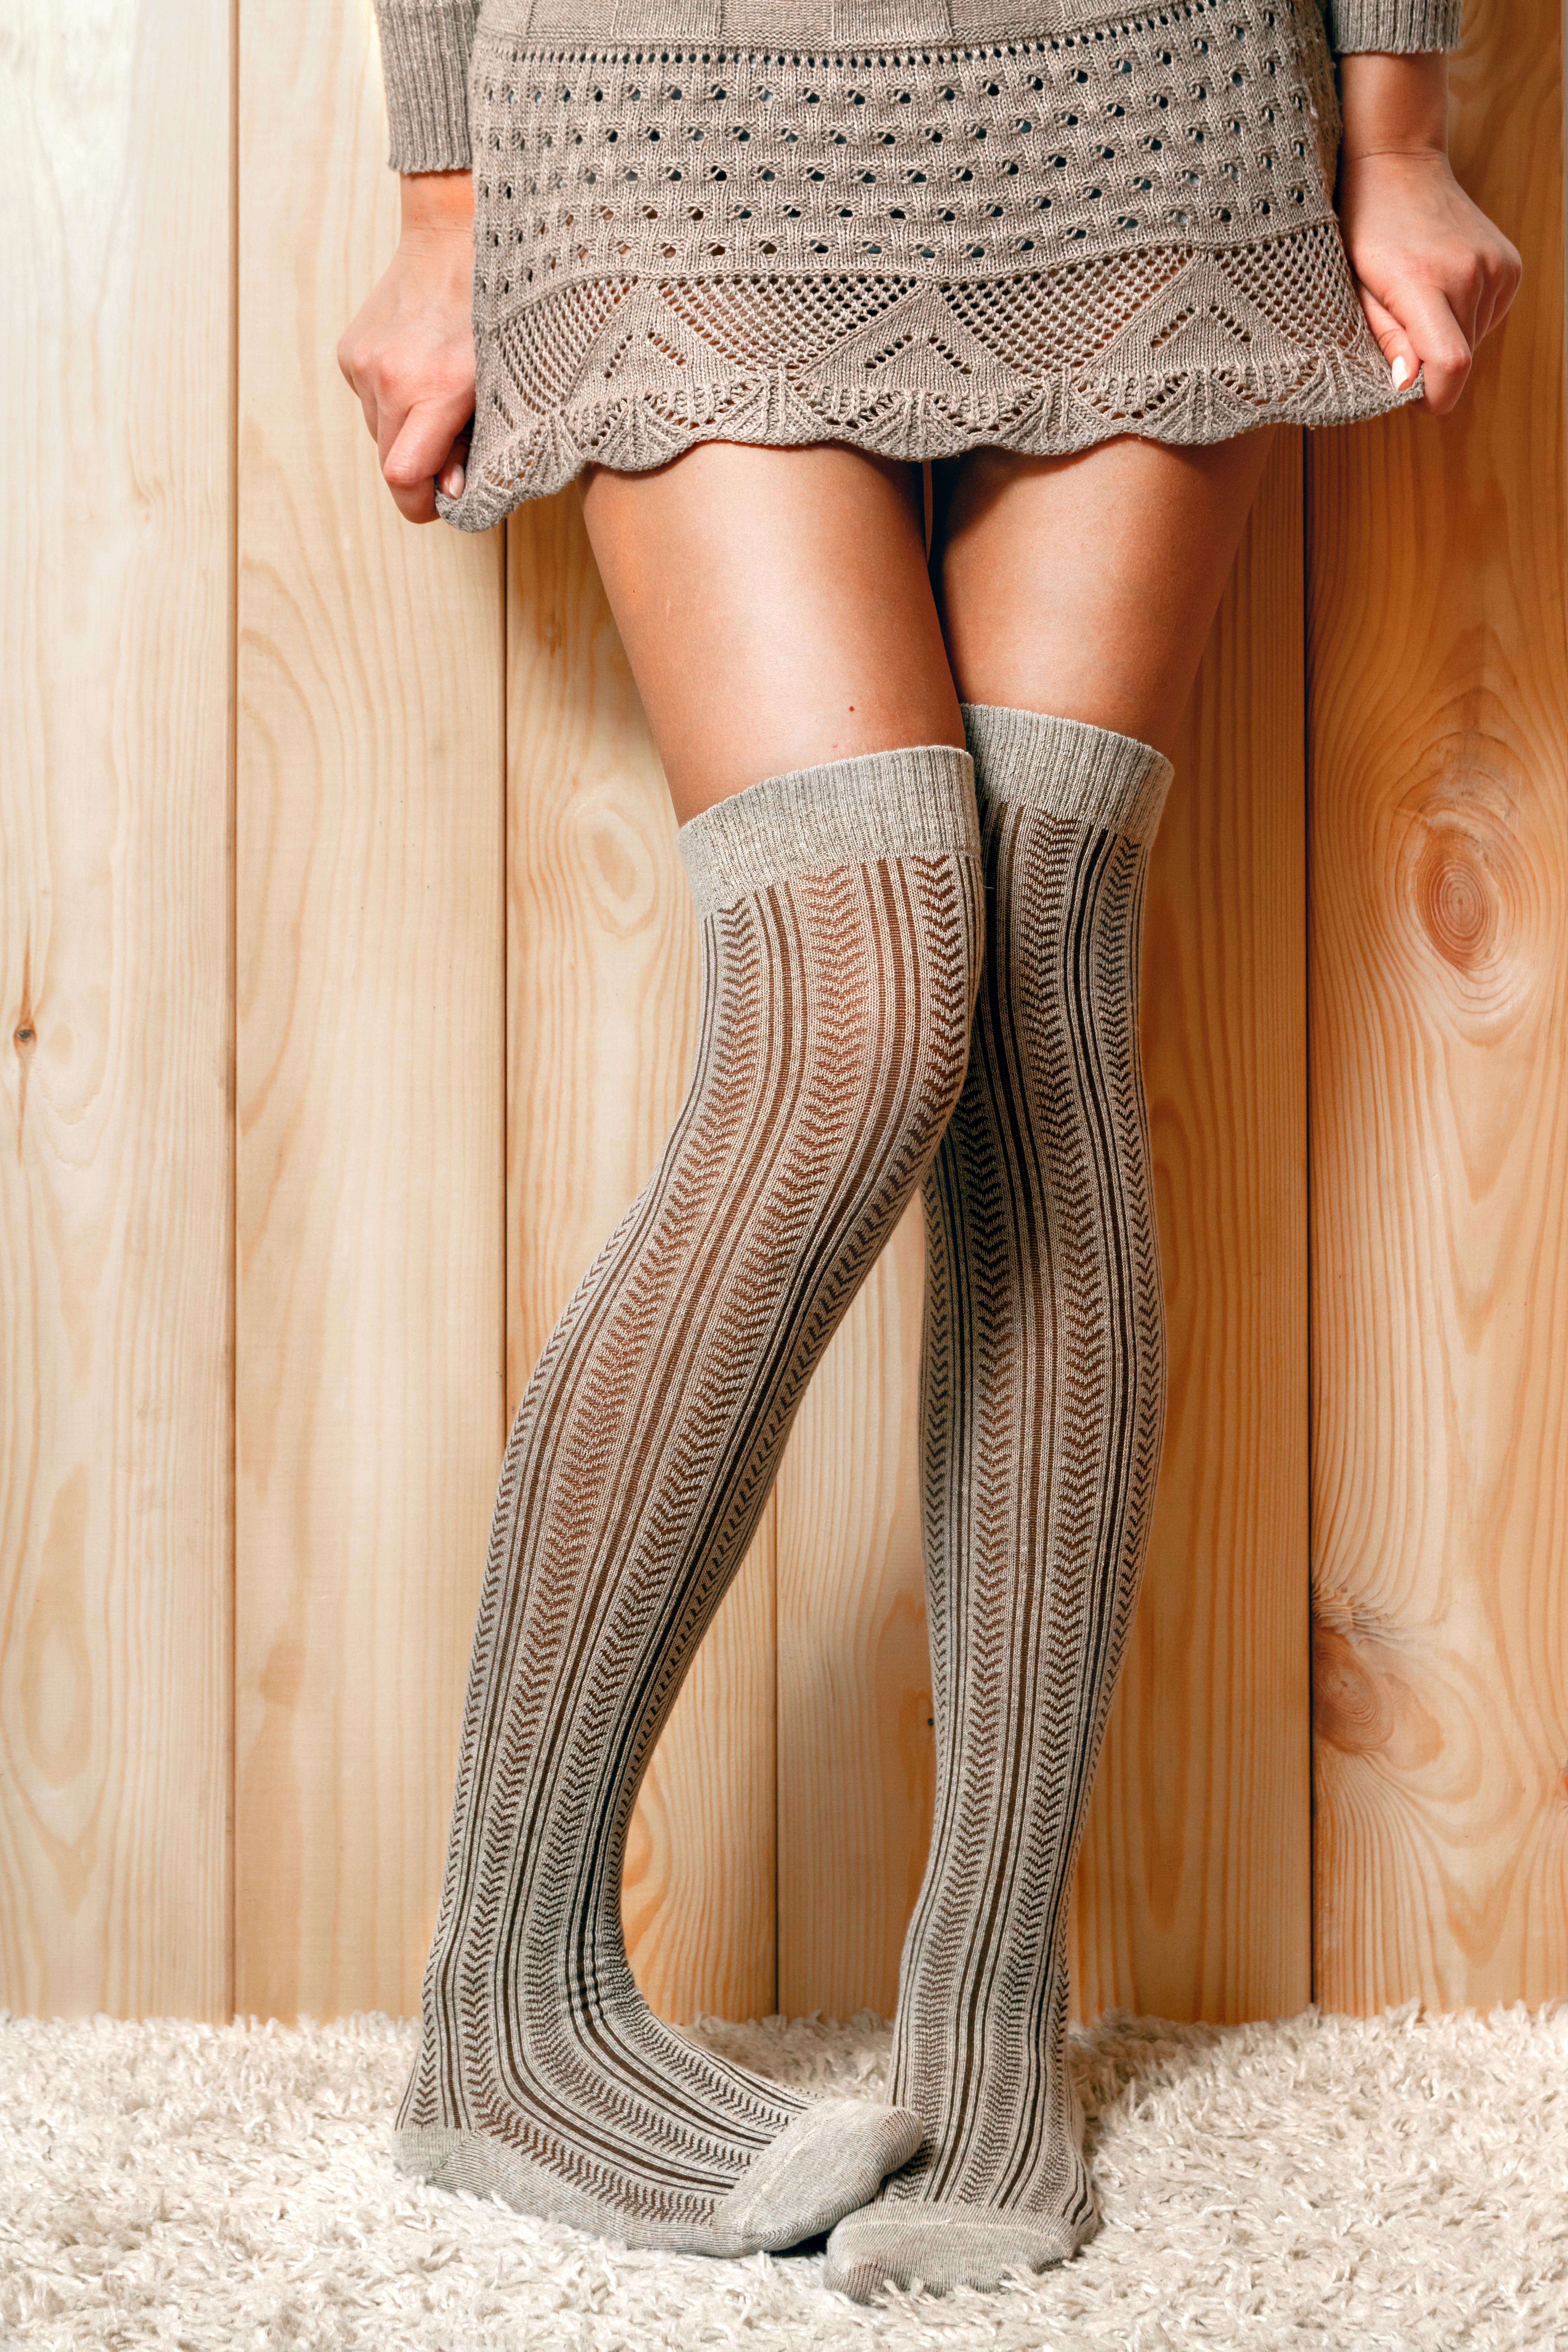 Female feet in socks